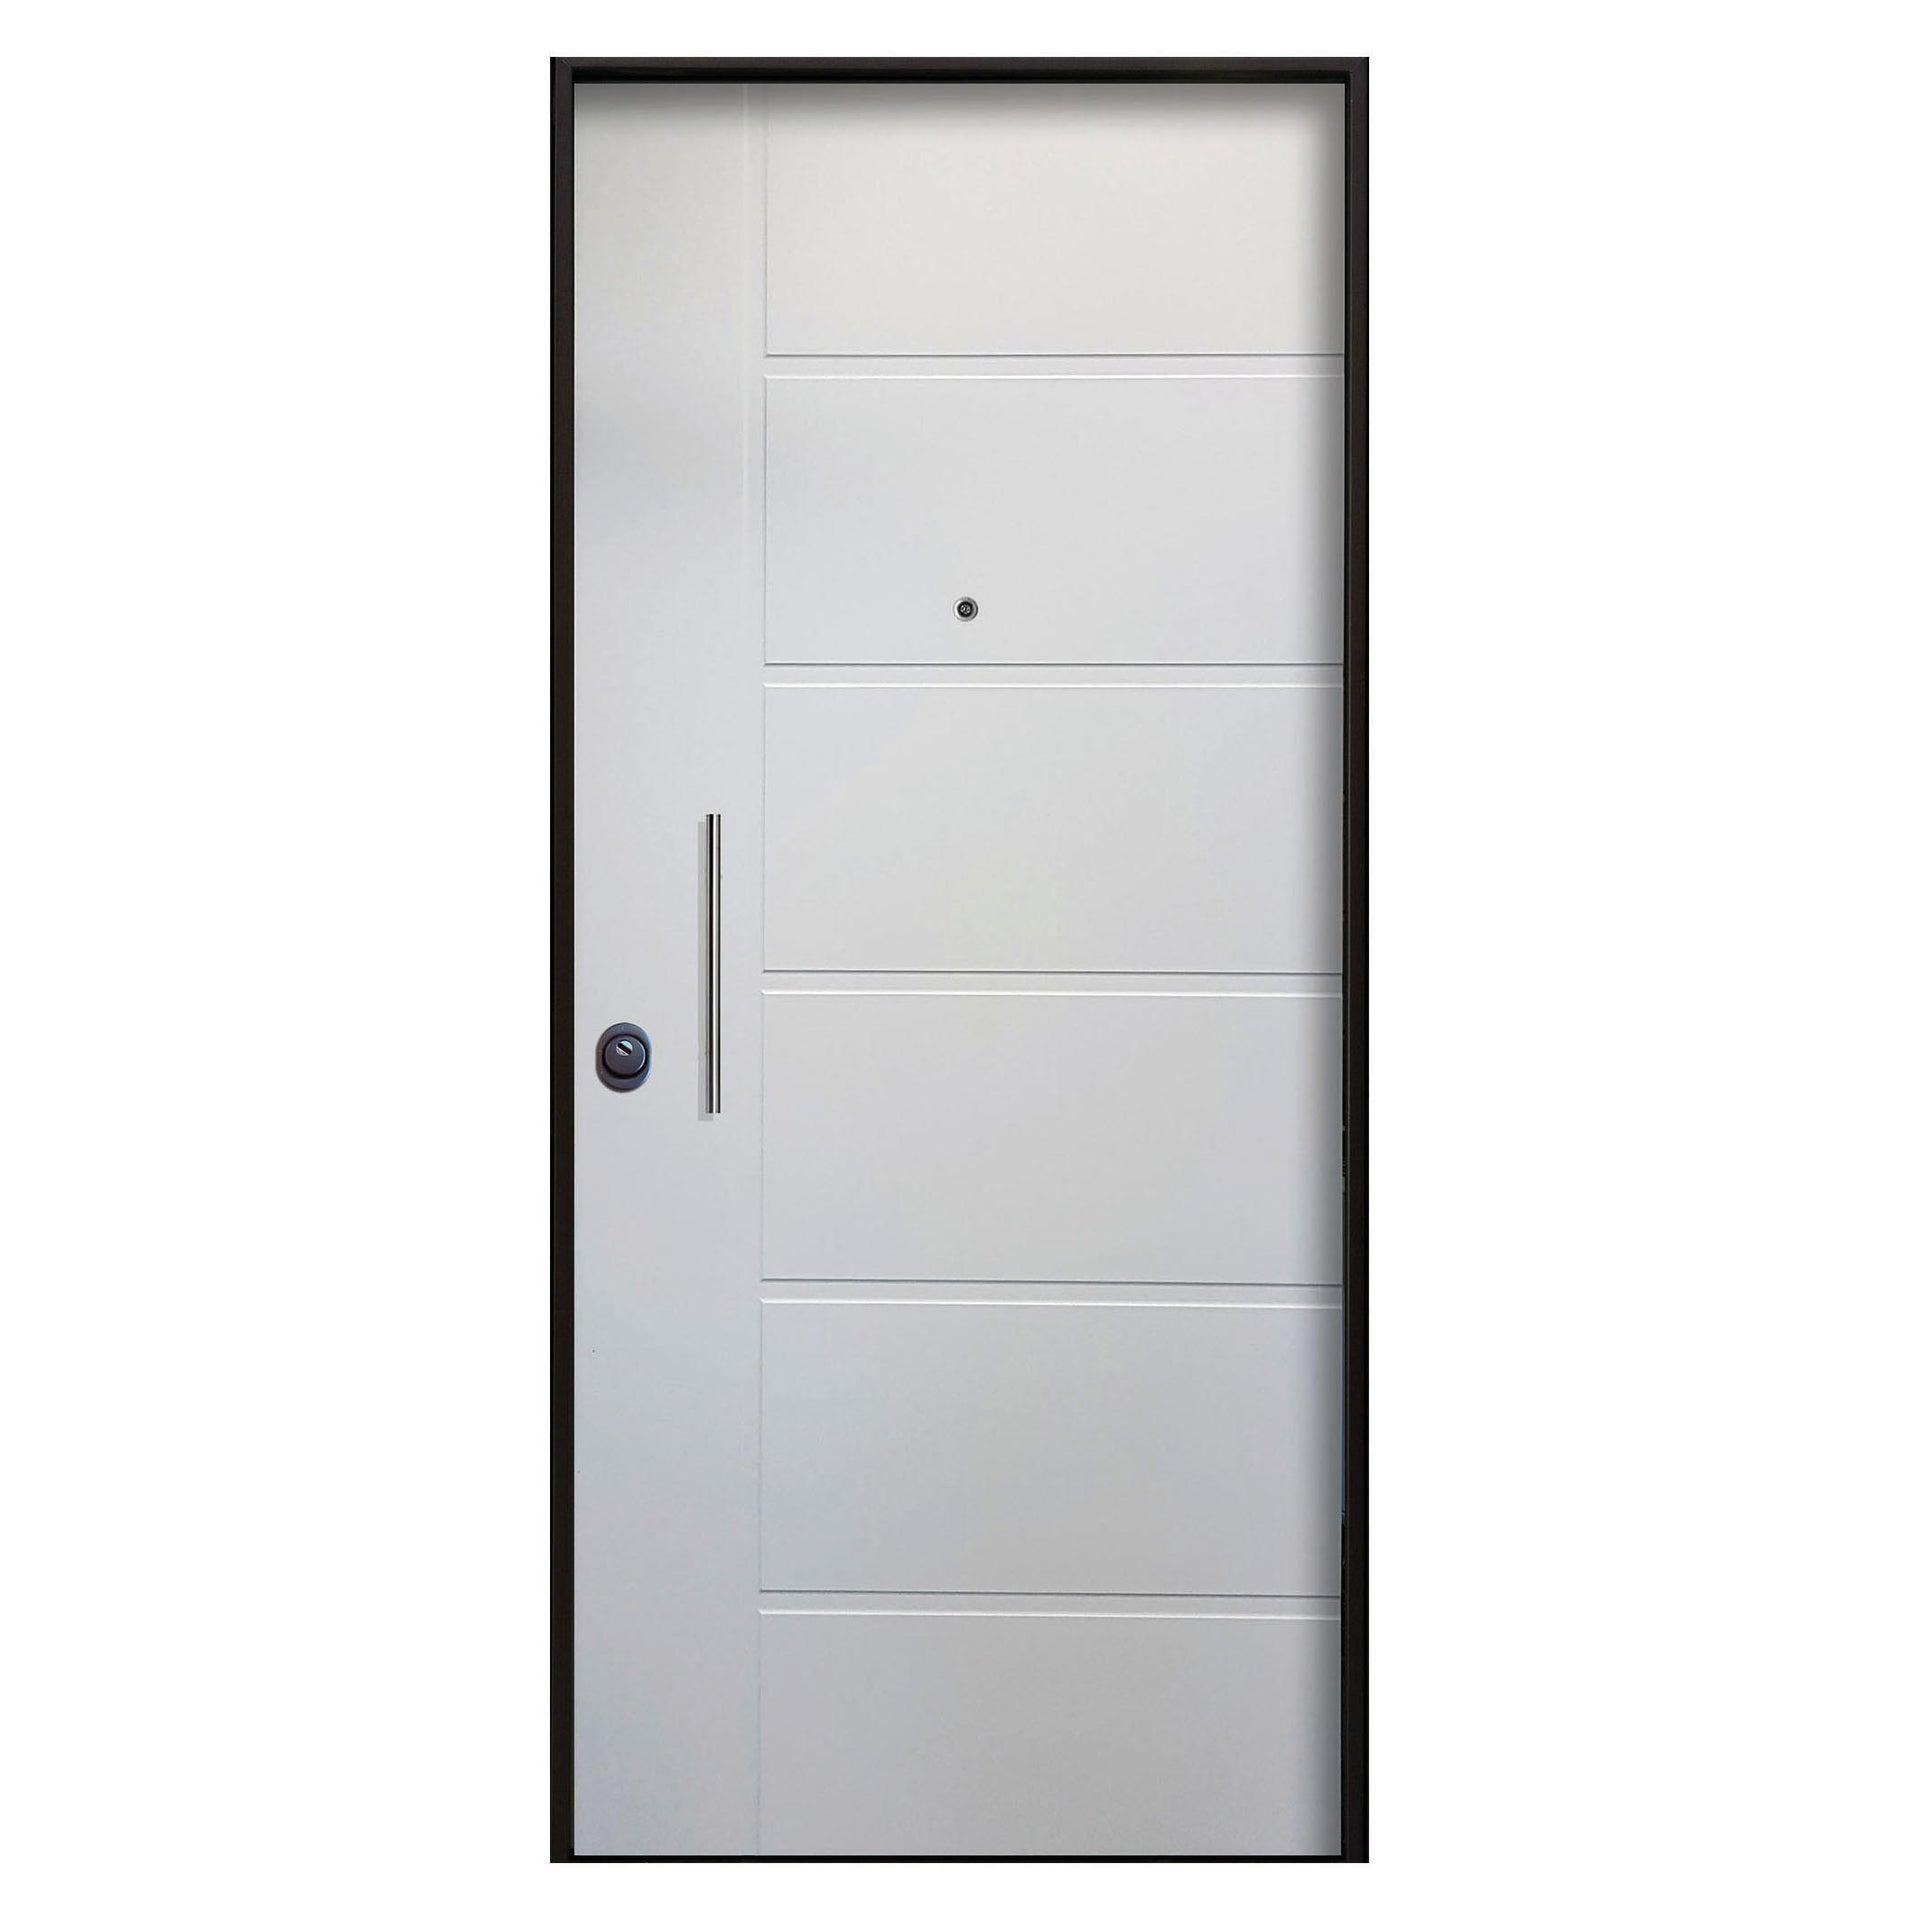 Porta blindata Sweet bianco L 80 x H 210 cm destra - 4